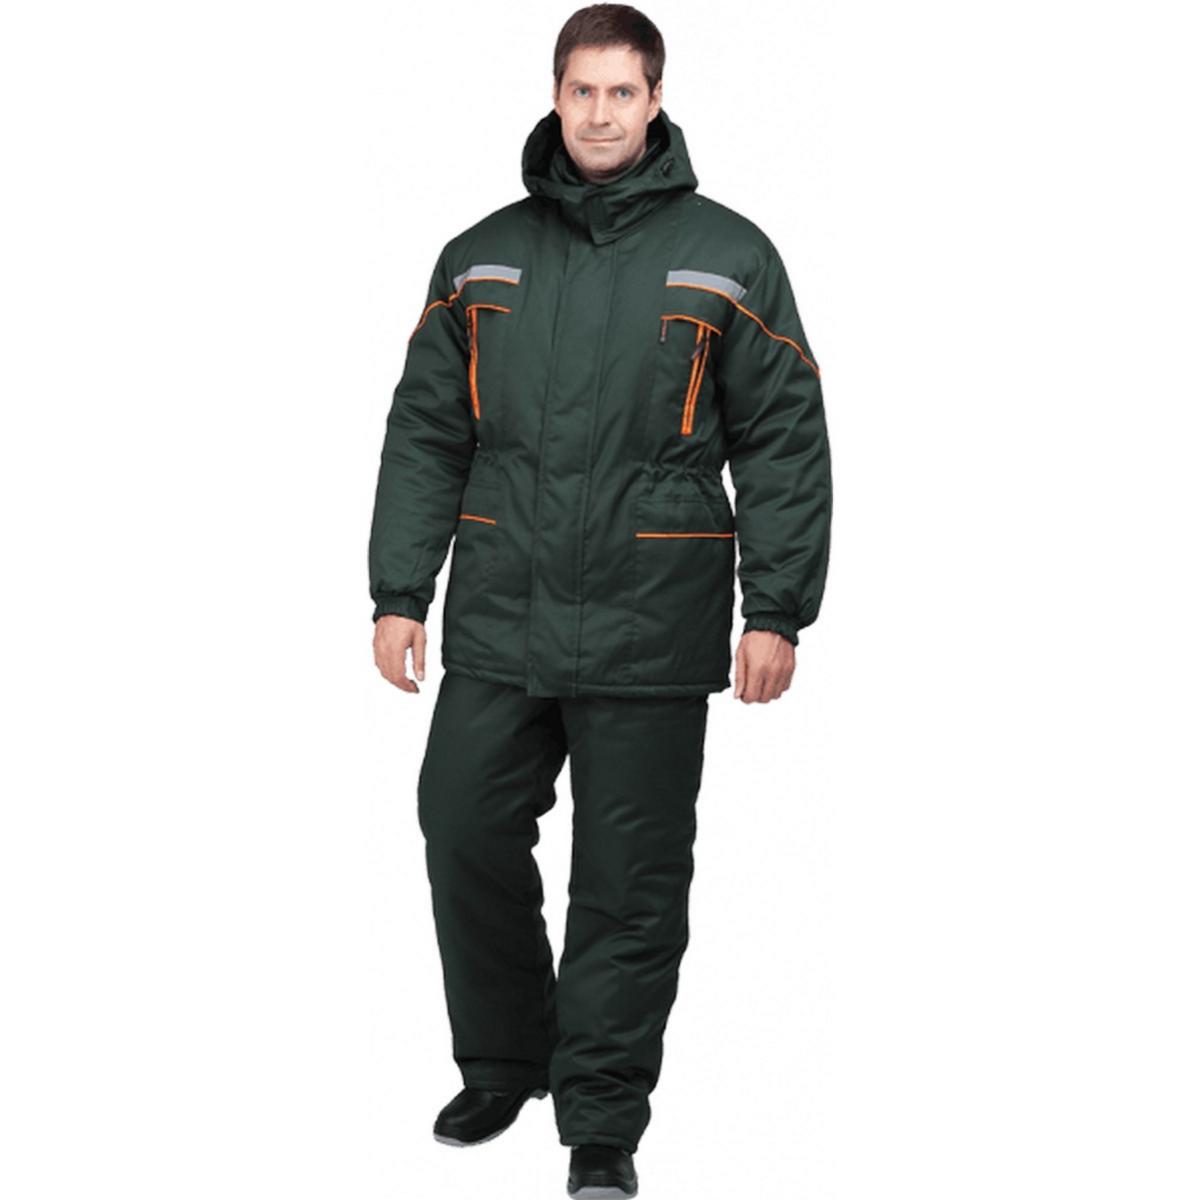 Куртка ЛАНДШАФТ утепленная зеленый (разм. 104-108 рост 170-176)